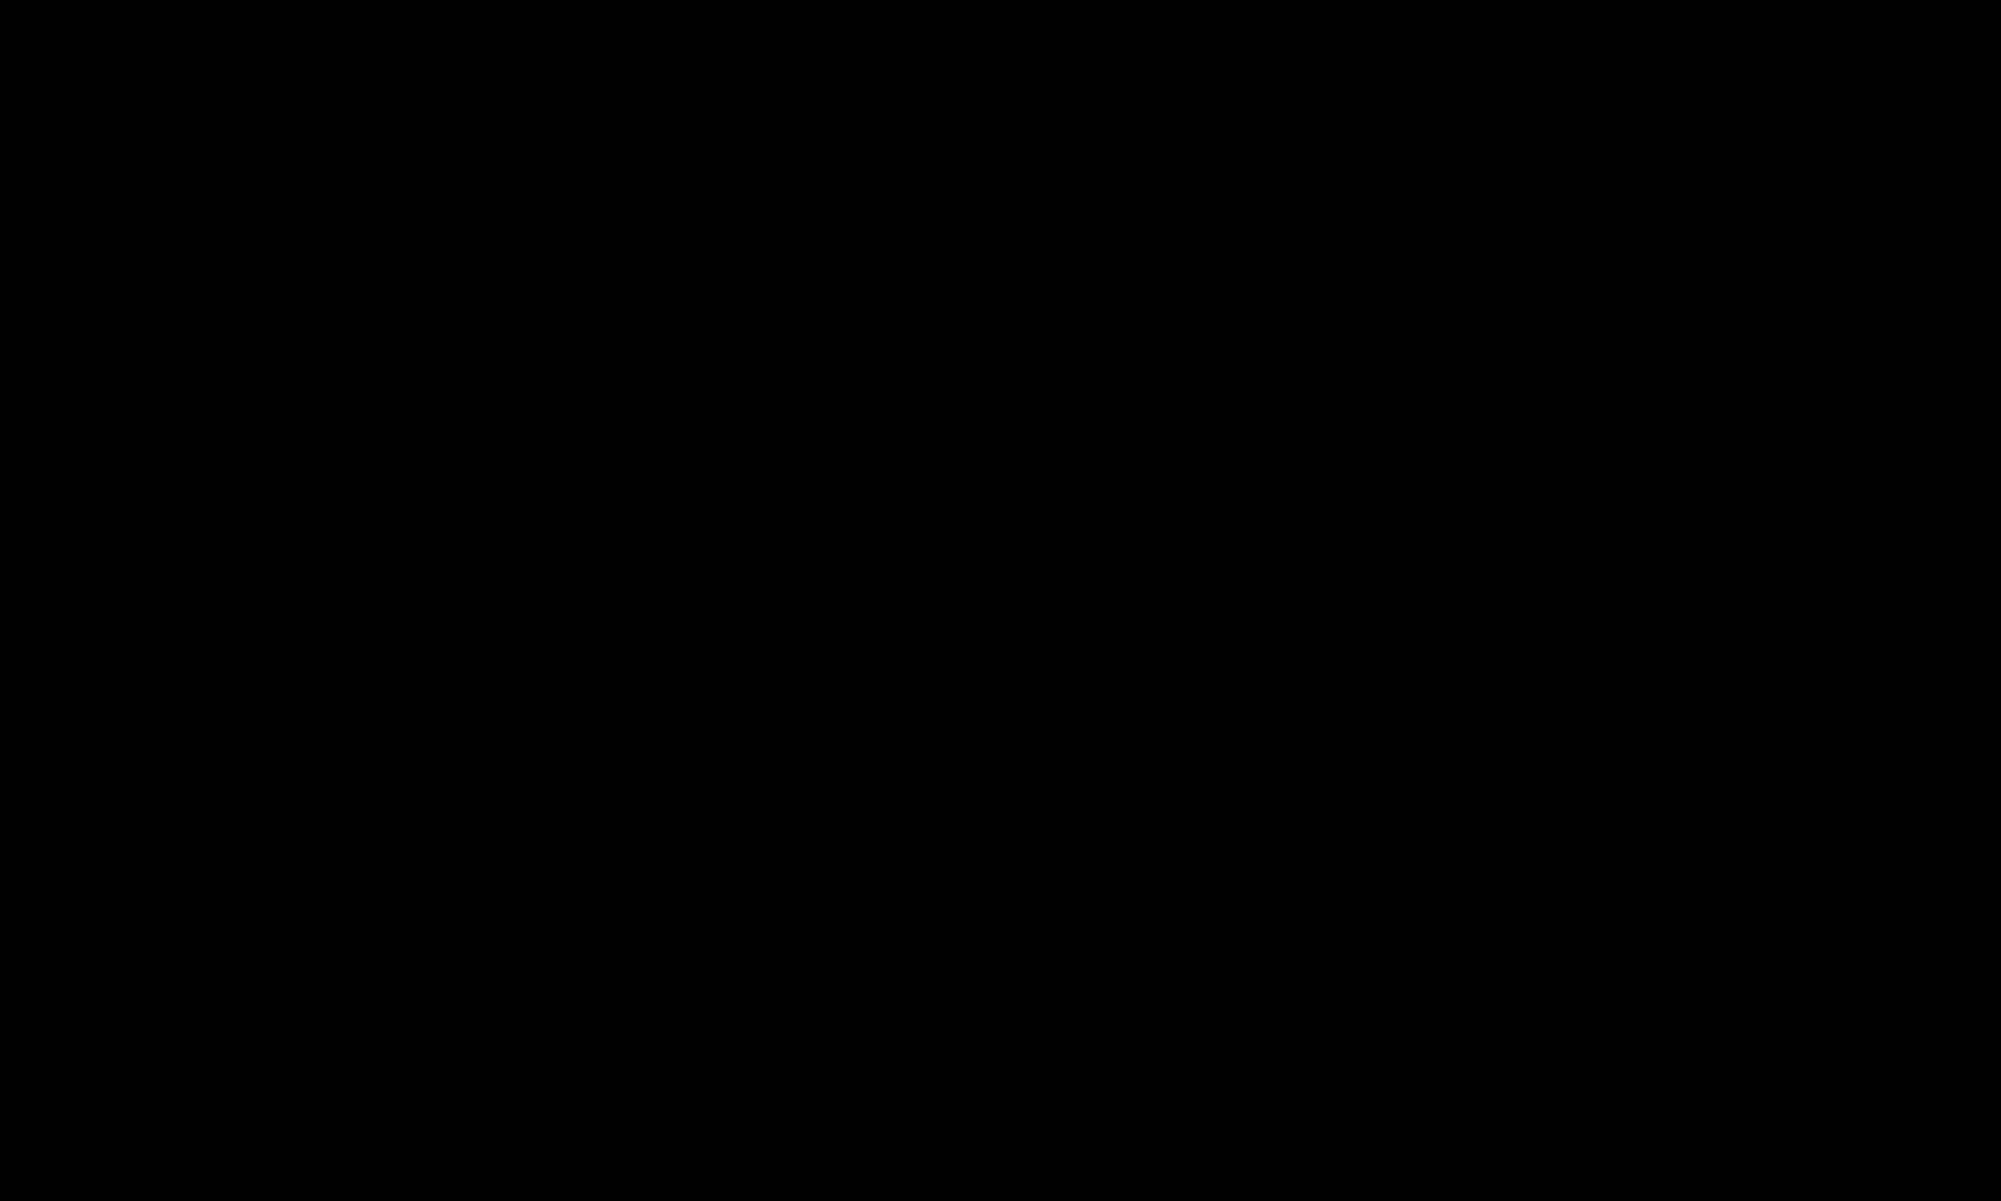 PngItem_5231596 (2)